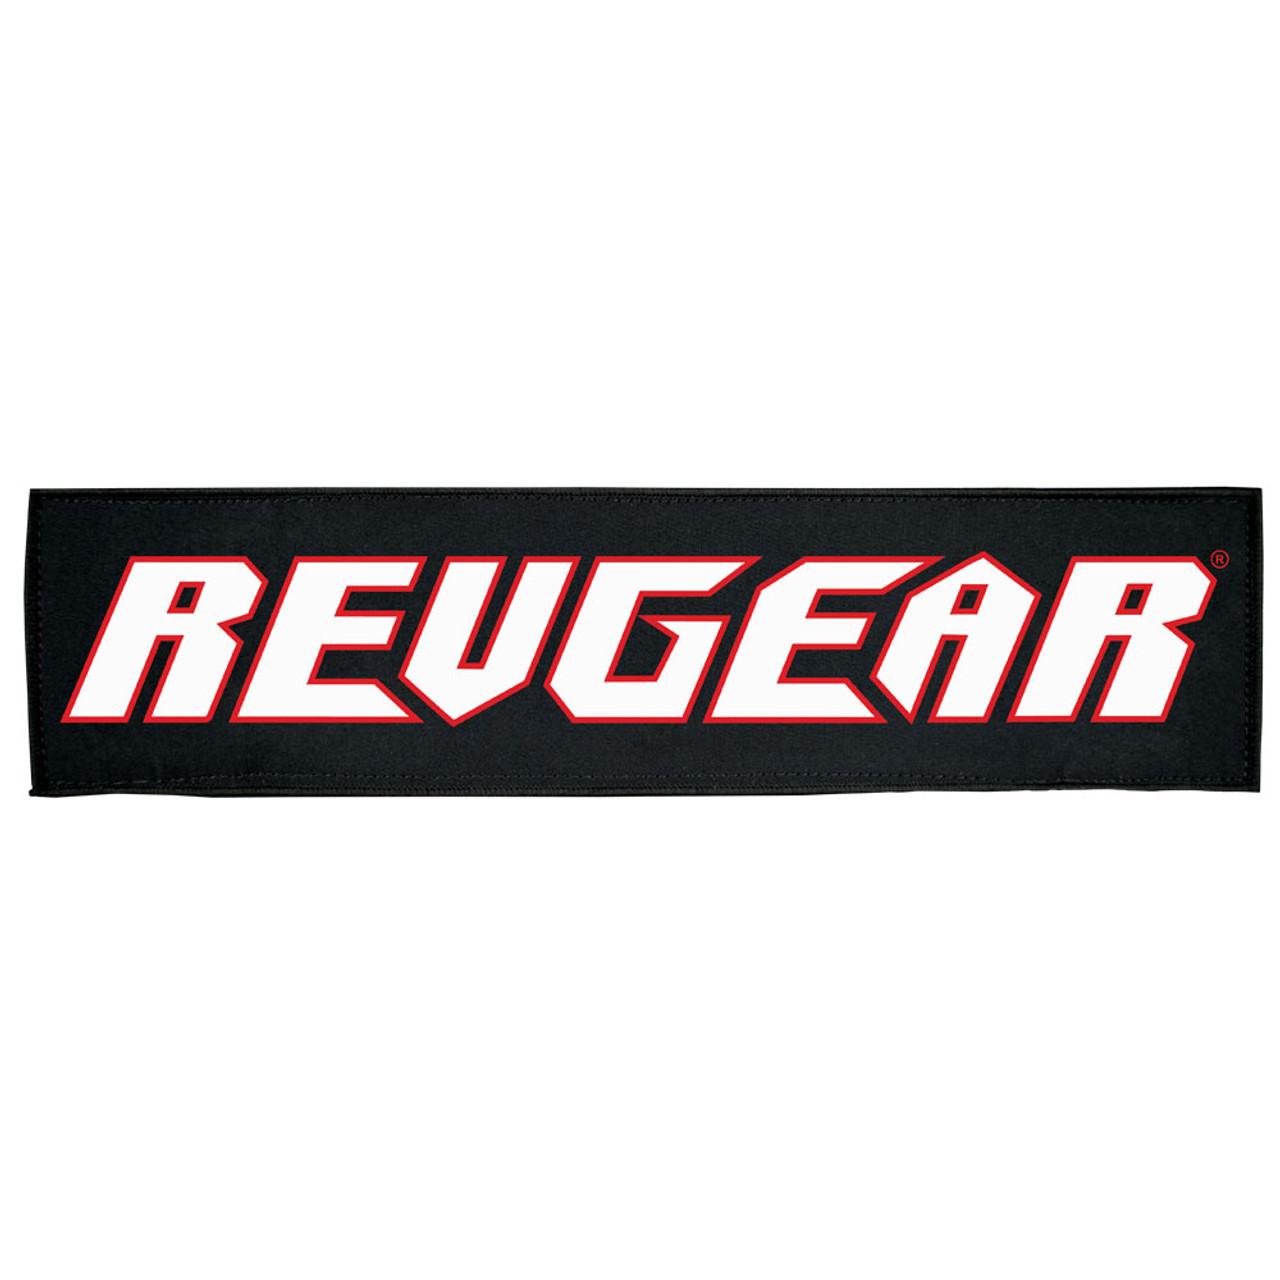 Revgear Fight Short Patch